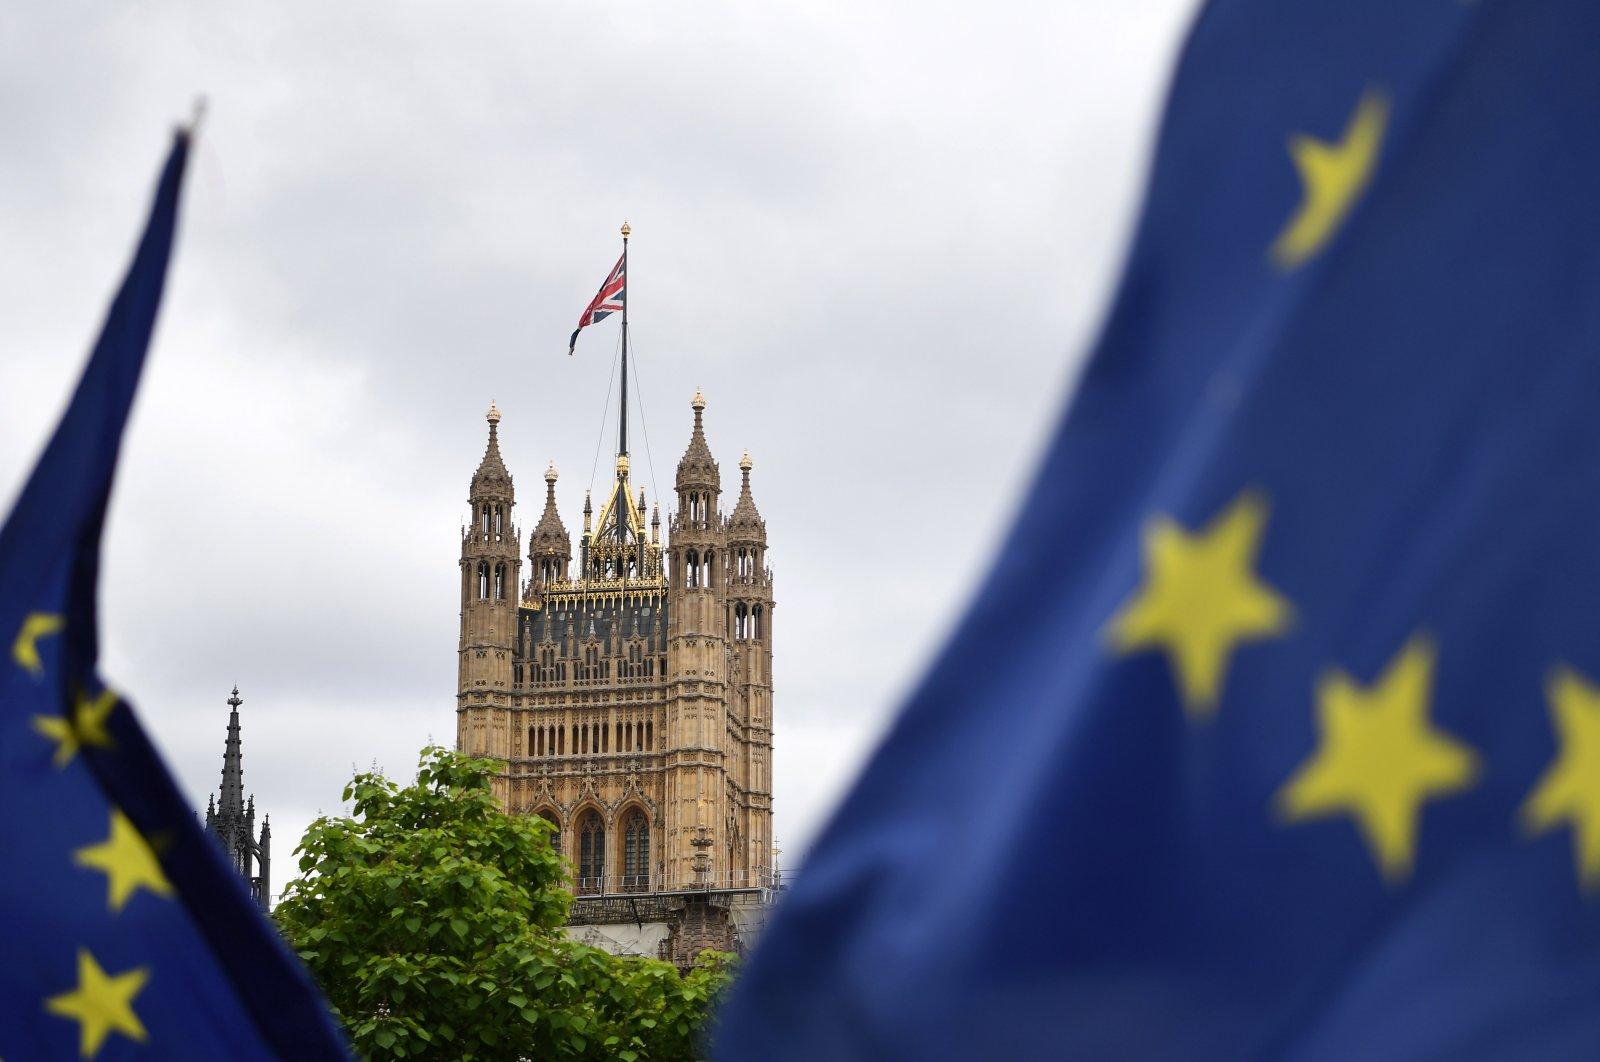 EU flag outside parliament in London, U.K., June 30, 2020. (EPA Photo)